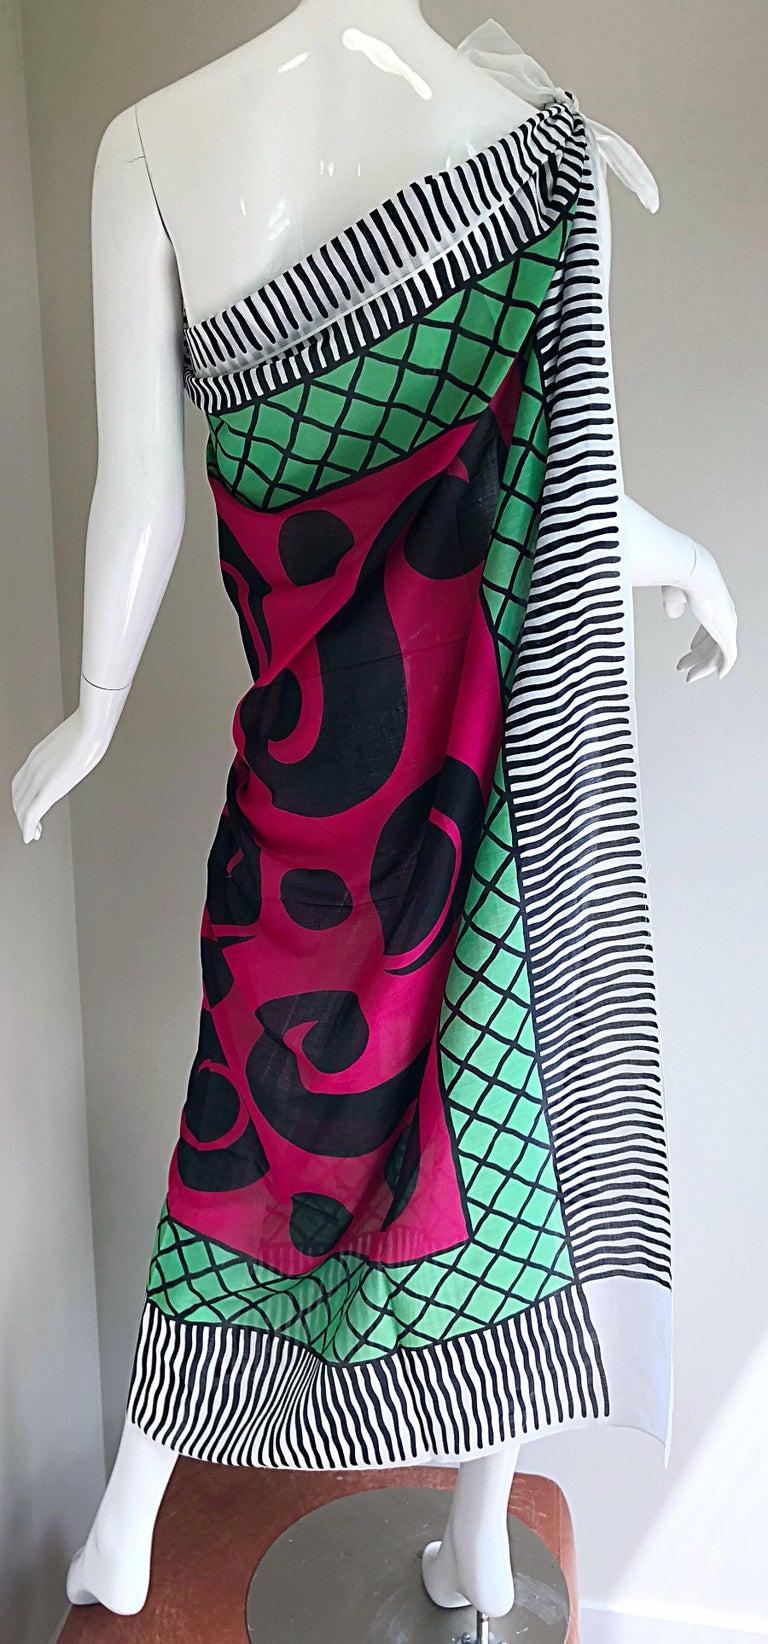 Vintage Yves Saint Laurent Iconic YSL Jumbo 55 x 55 Cotton Shawl Parero Dress For Sale 2